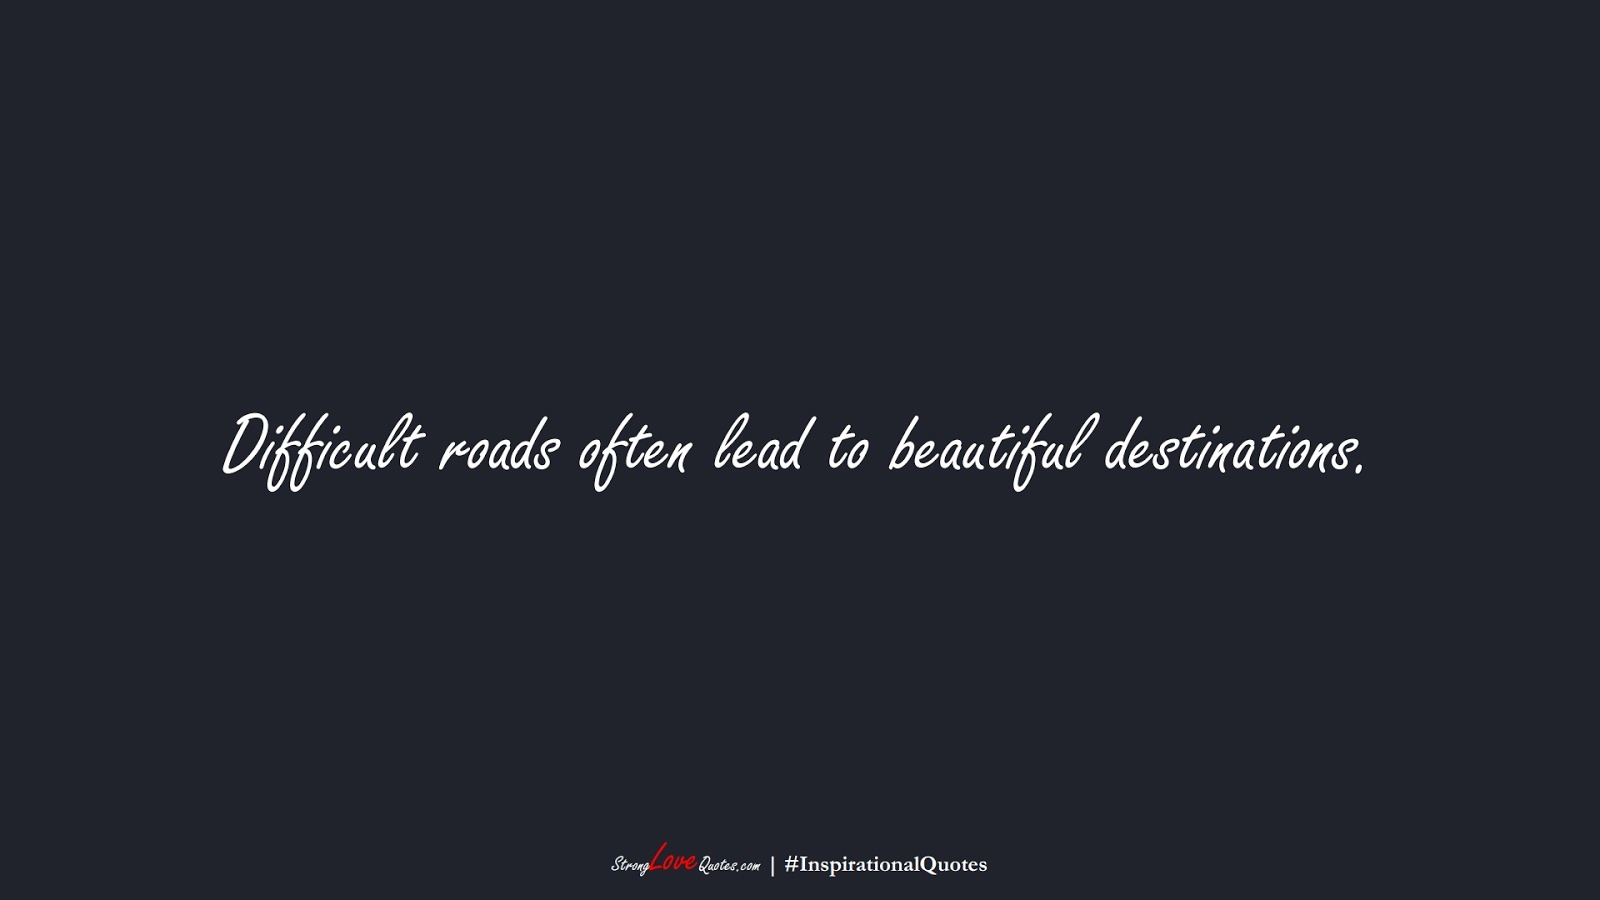 Difficult roads often lead to beautiful destinations.FALSE